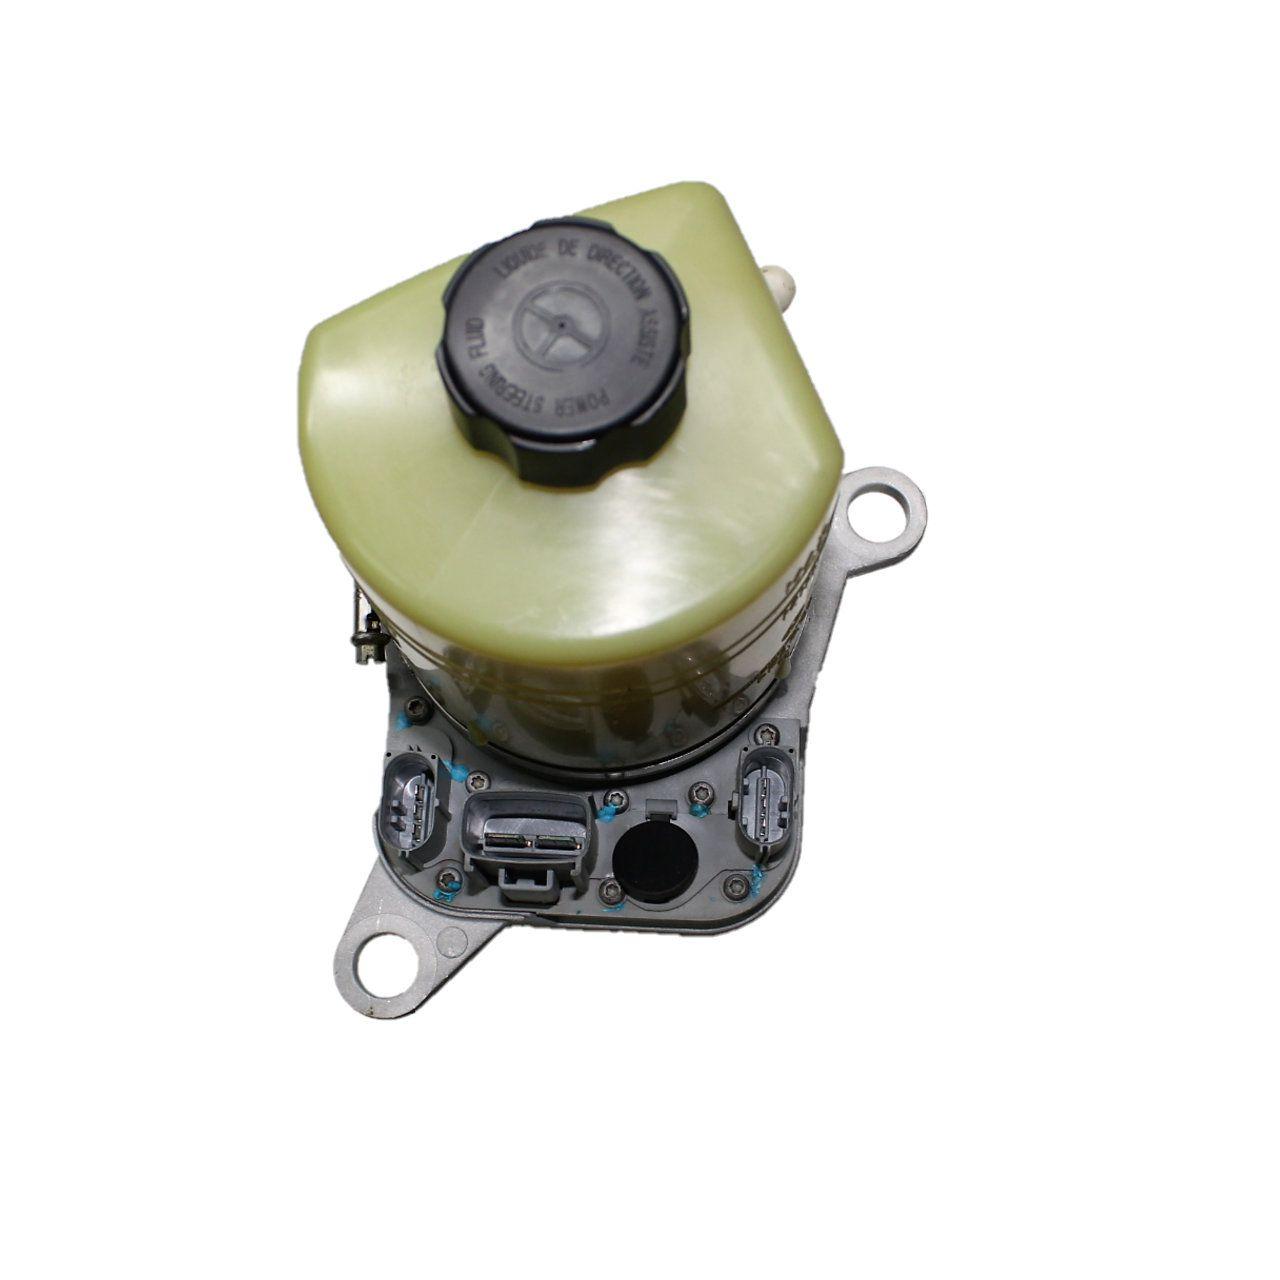 Bomba Direção Eletro-Hidráulica Ford Focus 2.0 - Recondicionada